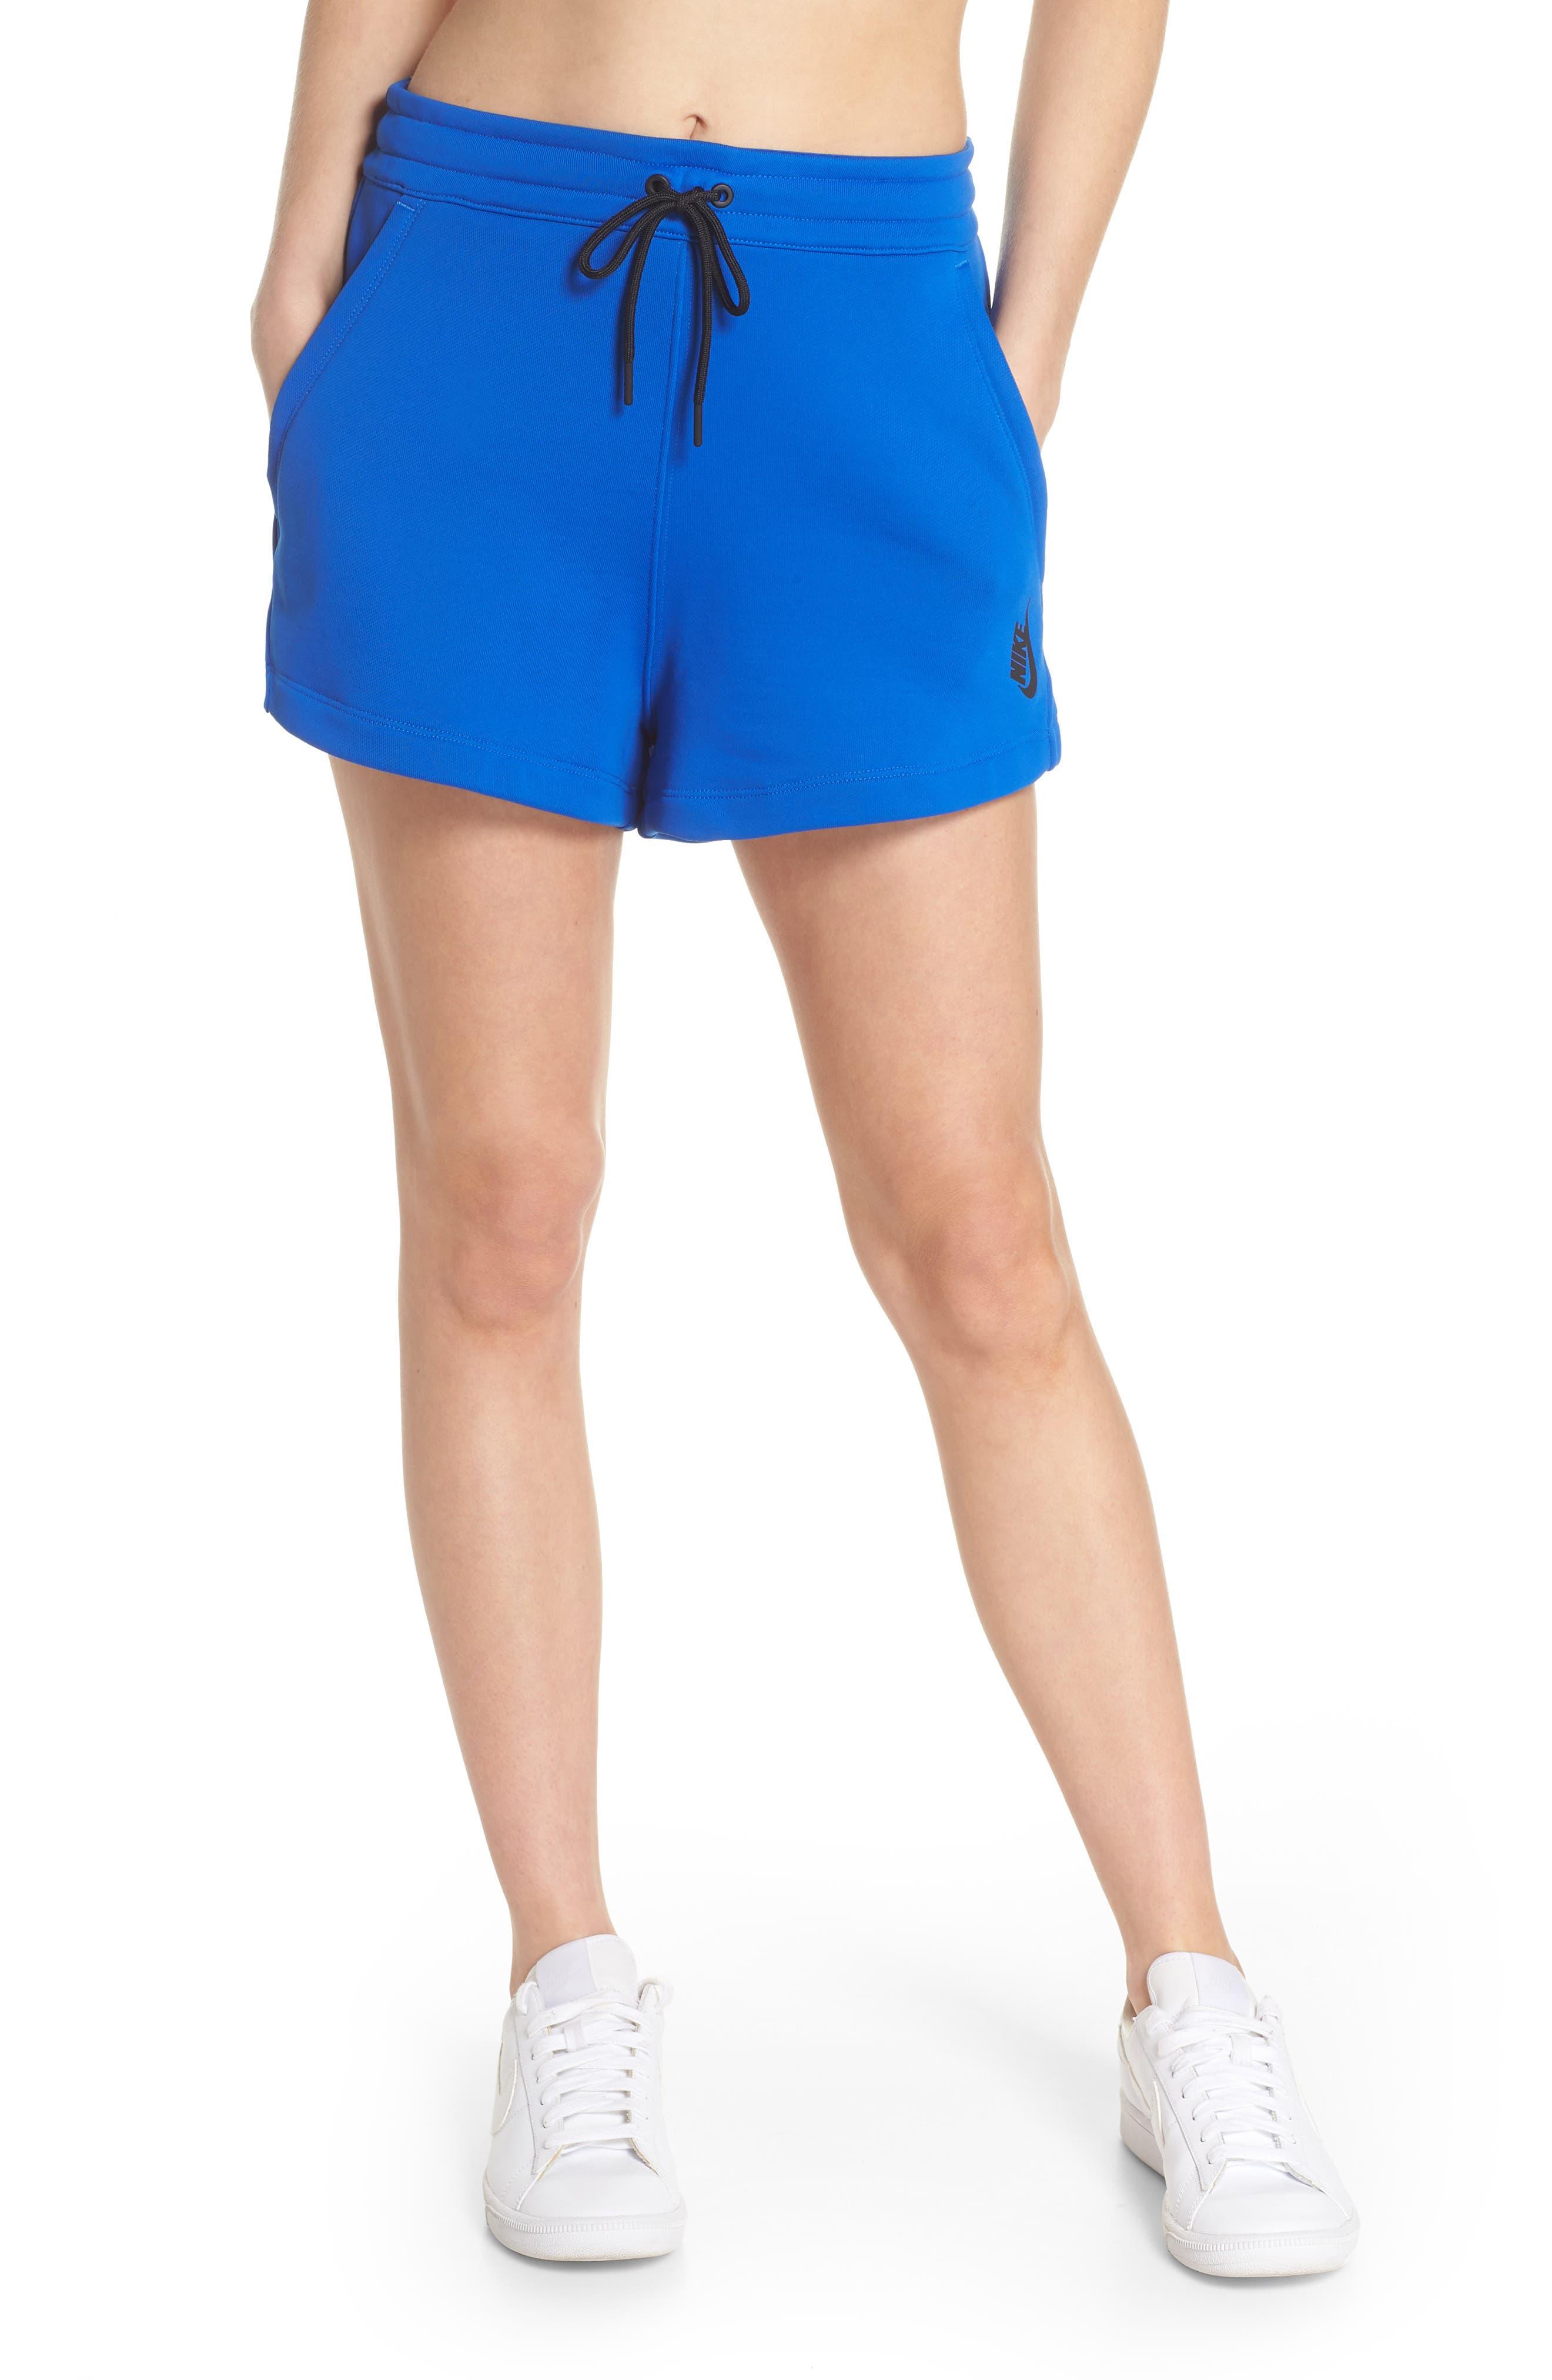 NikeLab Collection Women's Fleece Shorts,                             Main thumbnail 1, color,                             Hyper Cobalt/ Black